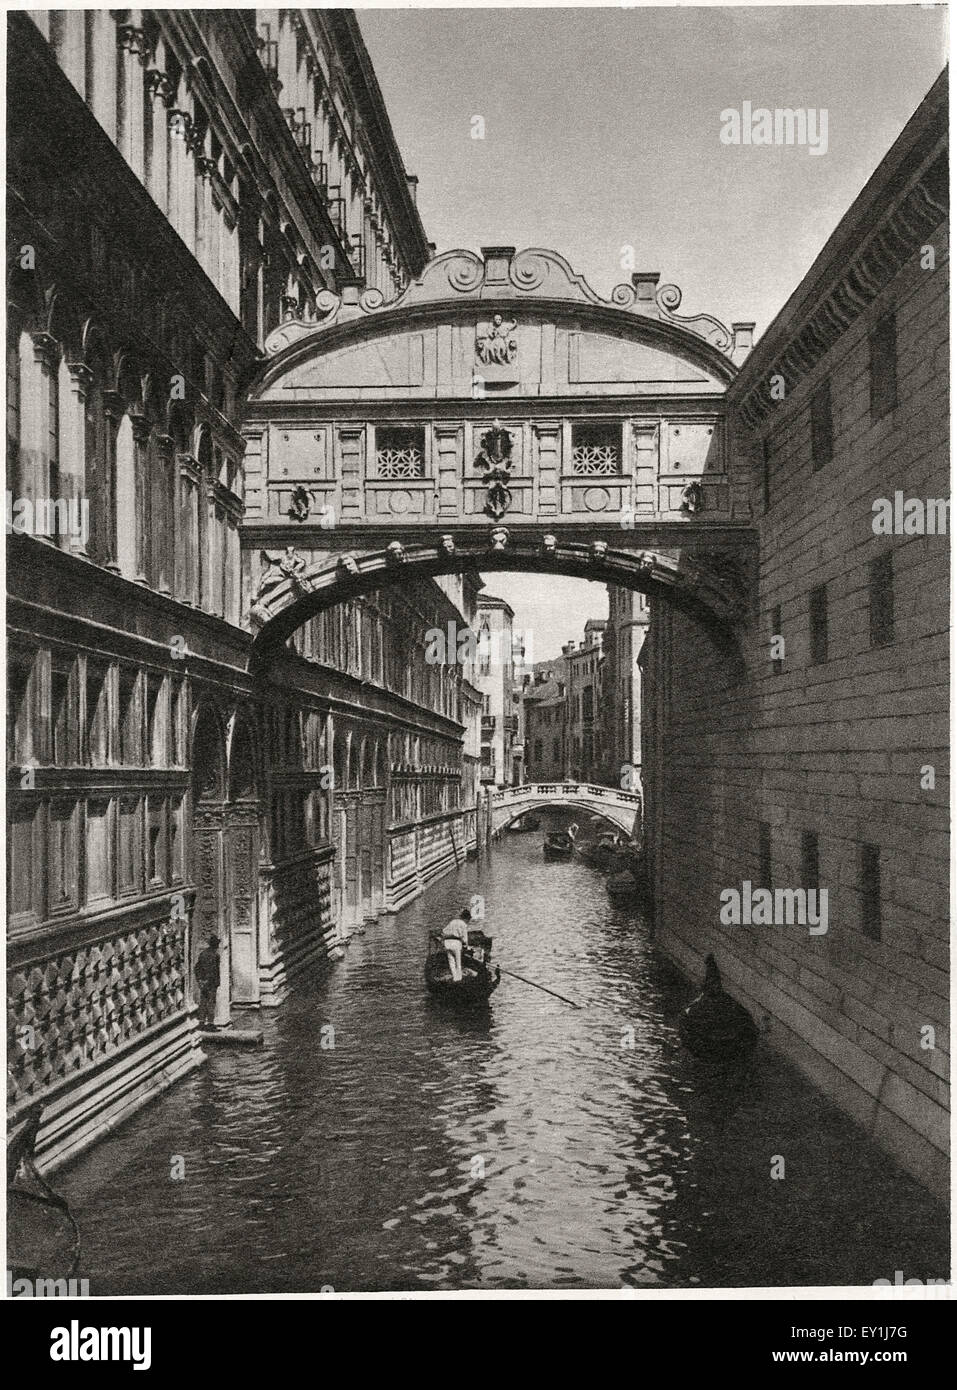 Bridge of Sighs, Venice, Italy, circa 1910 - Stock Image